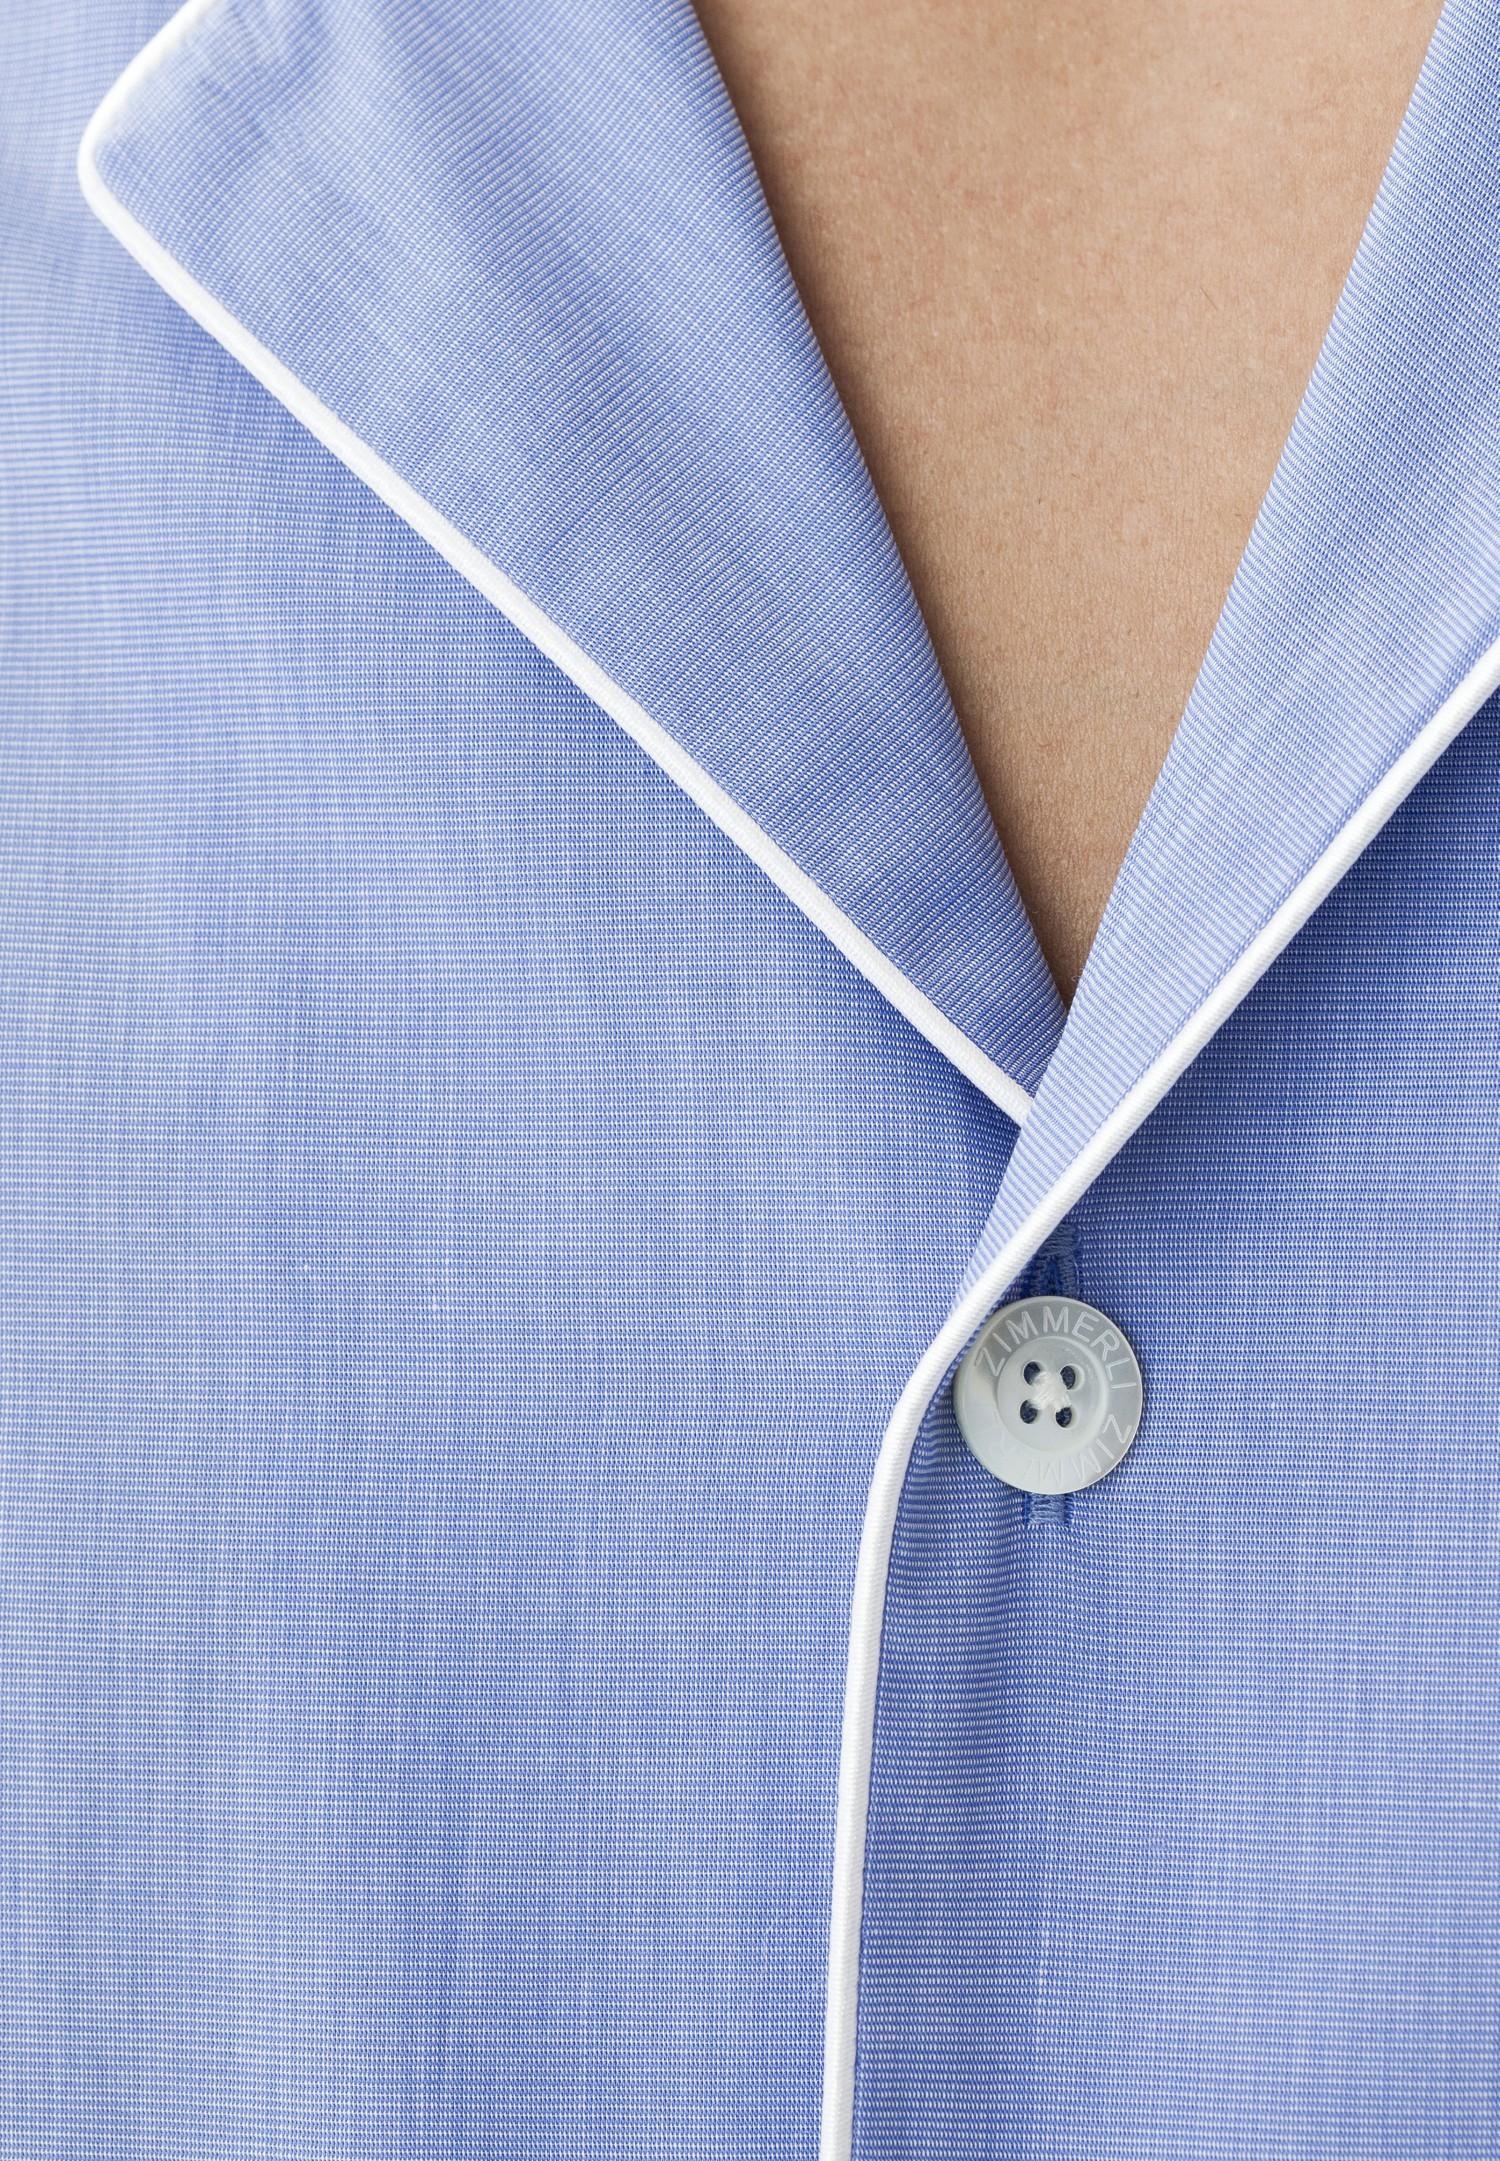 57c9c602b5 Zimmerli Charcoal or Blue PJs - The Pyjama Store